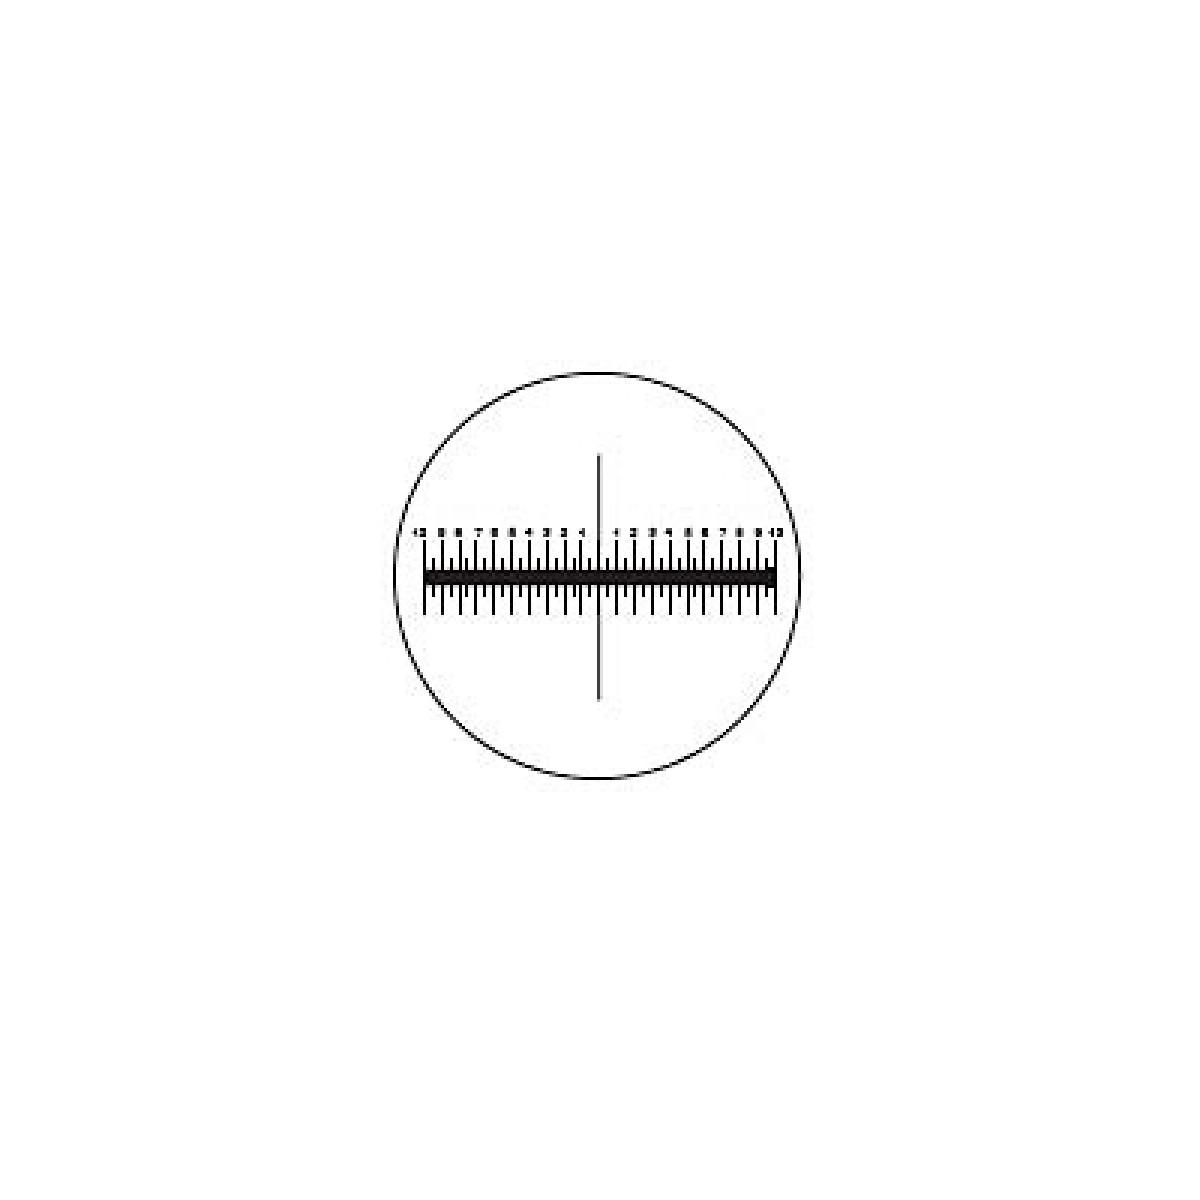 Reticles/Micrometers